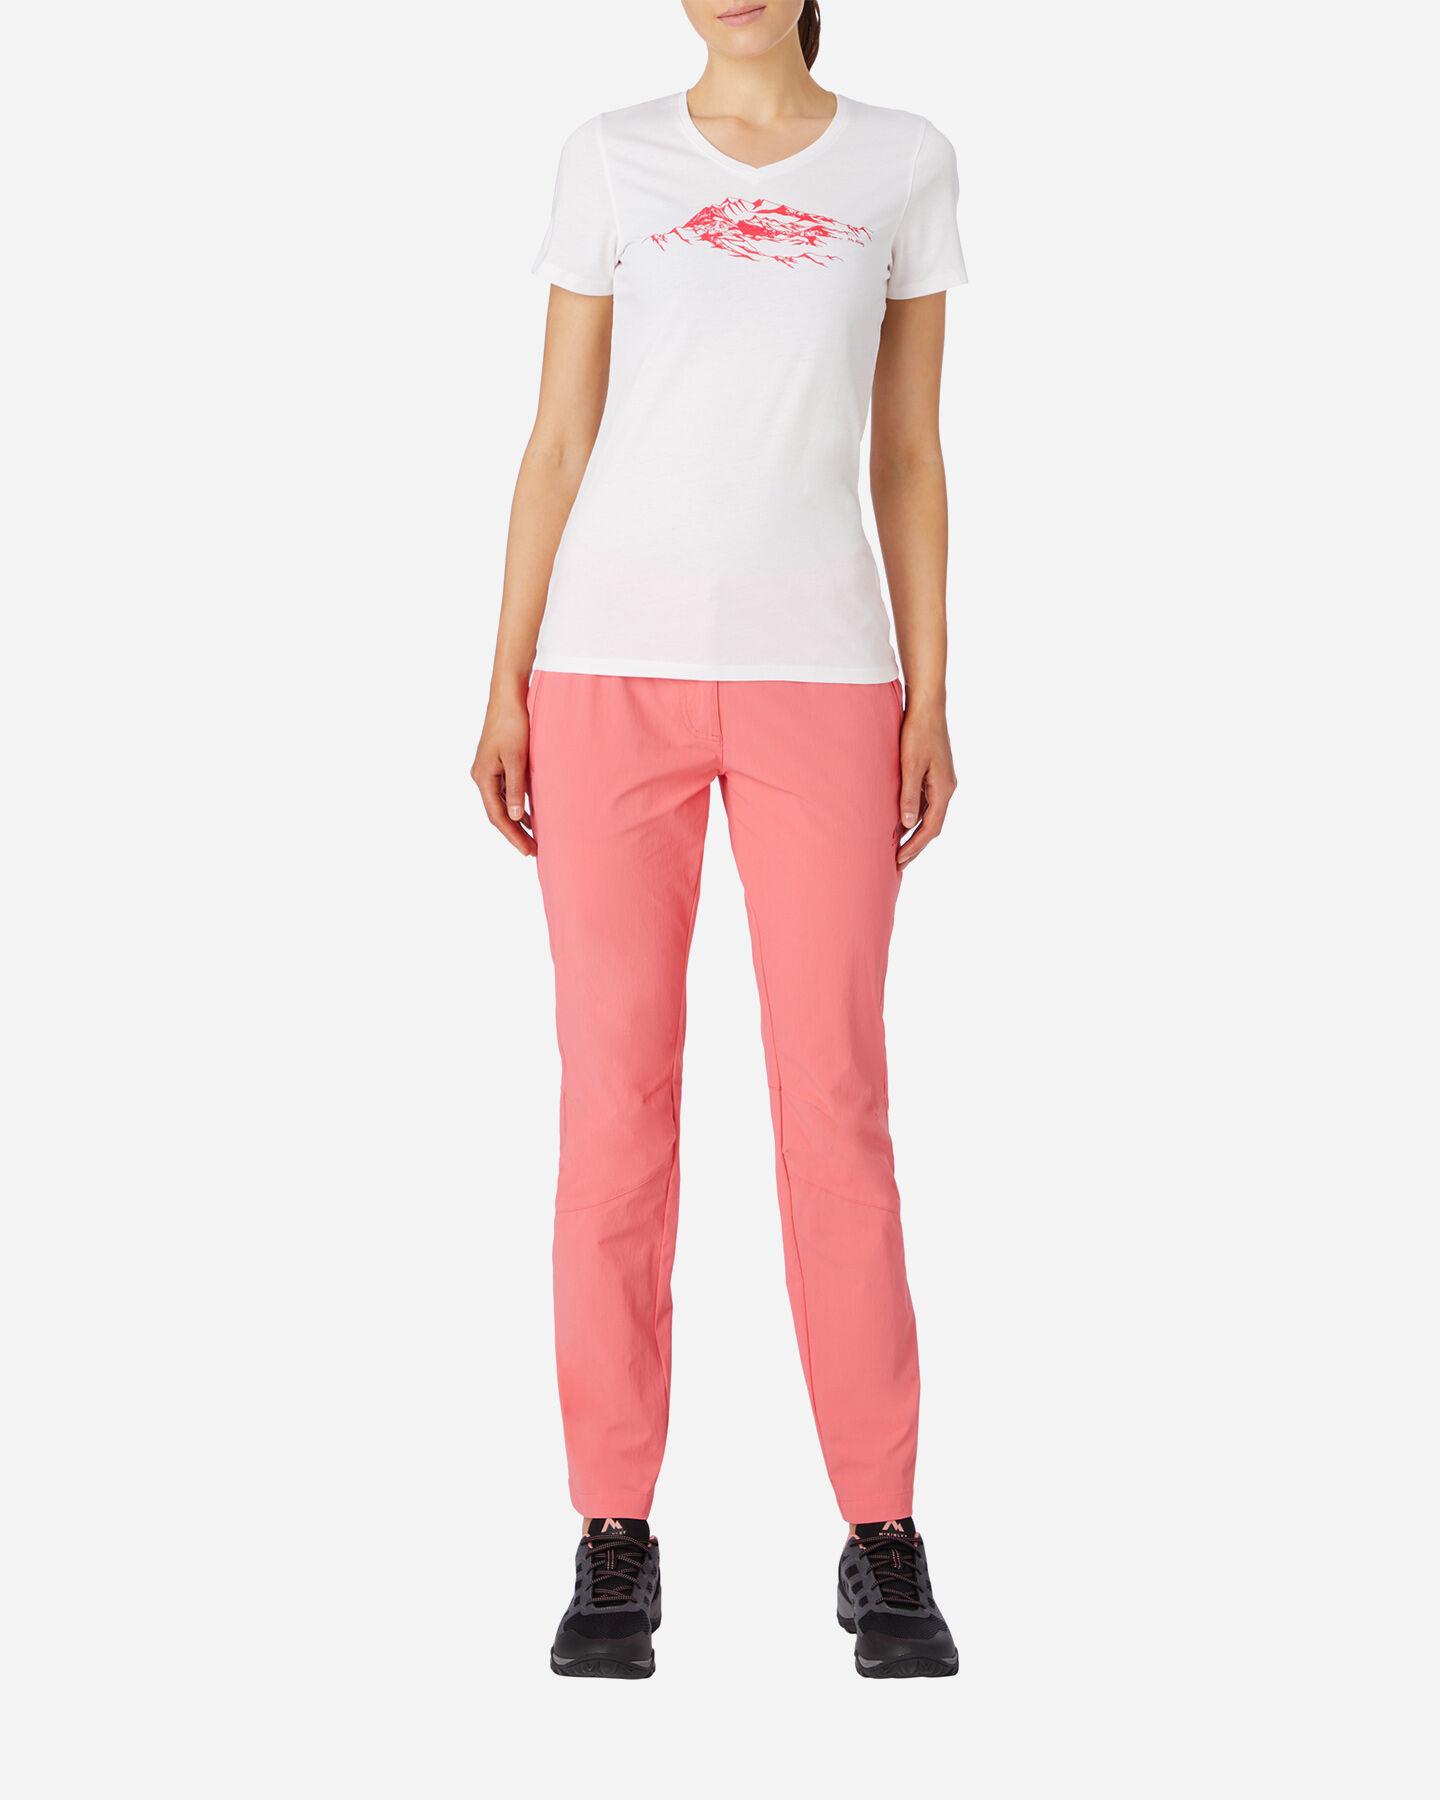 T-Shirt MCKINLEY KULMA W S5266688 scatto 3